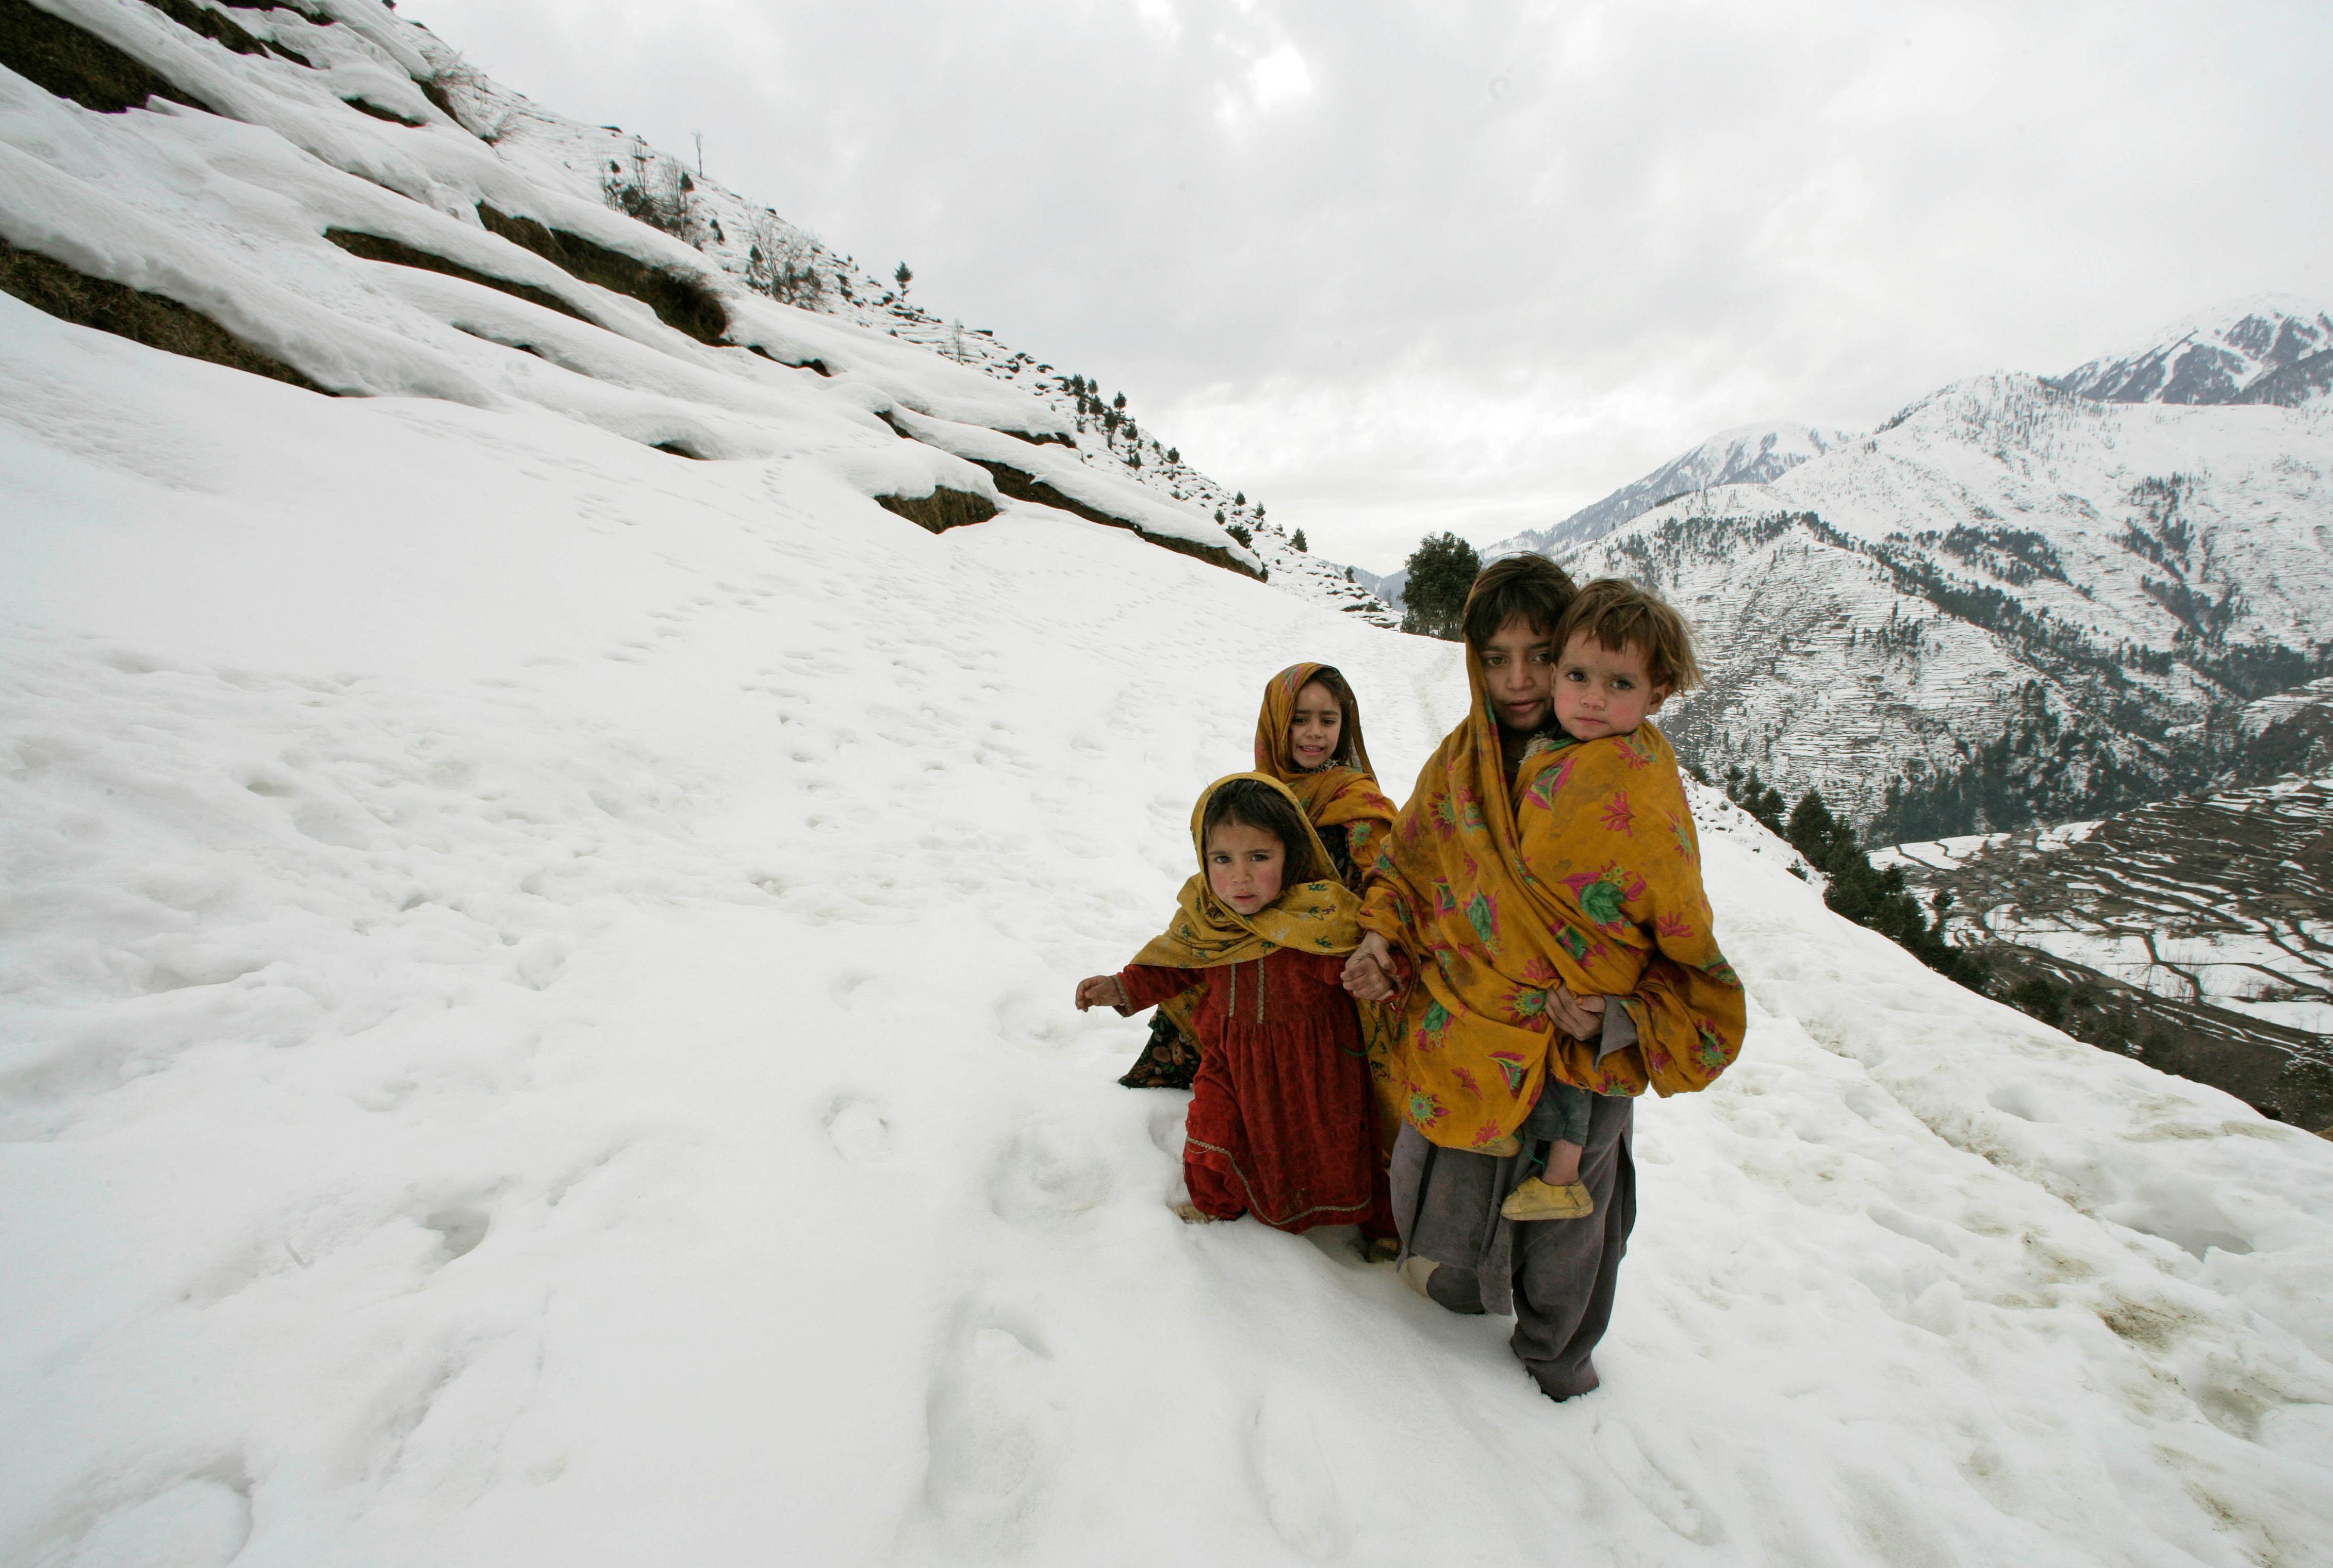 Buy a Guardian classic photograph: Girls walk in the snow, Pakistan, 2006